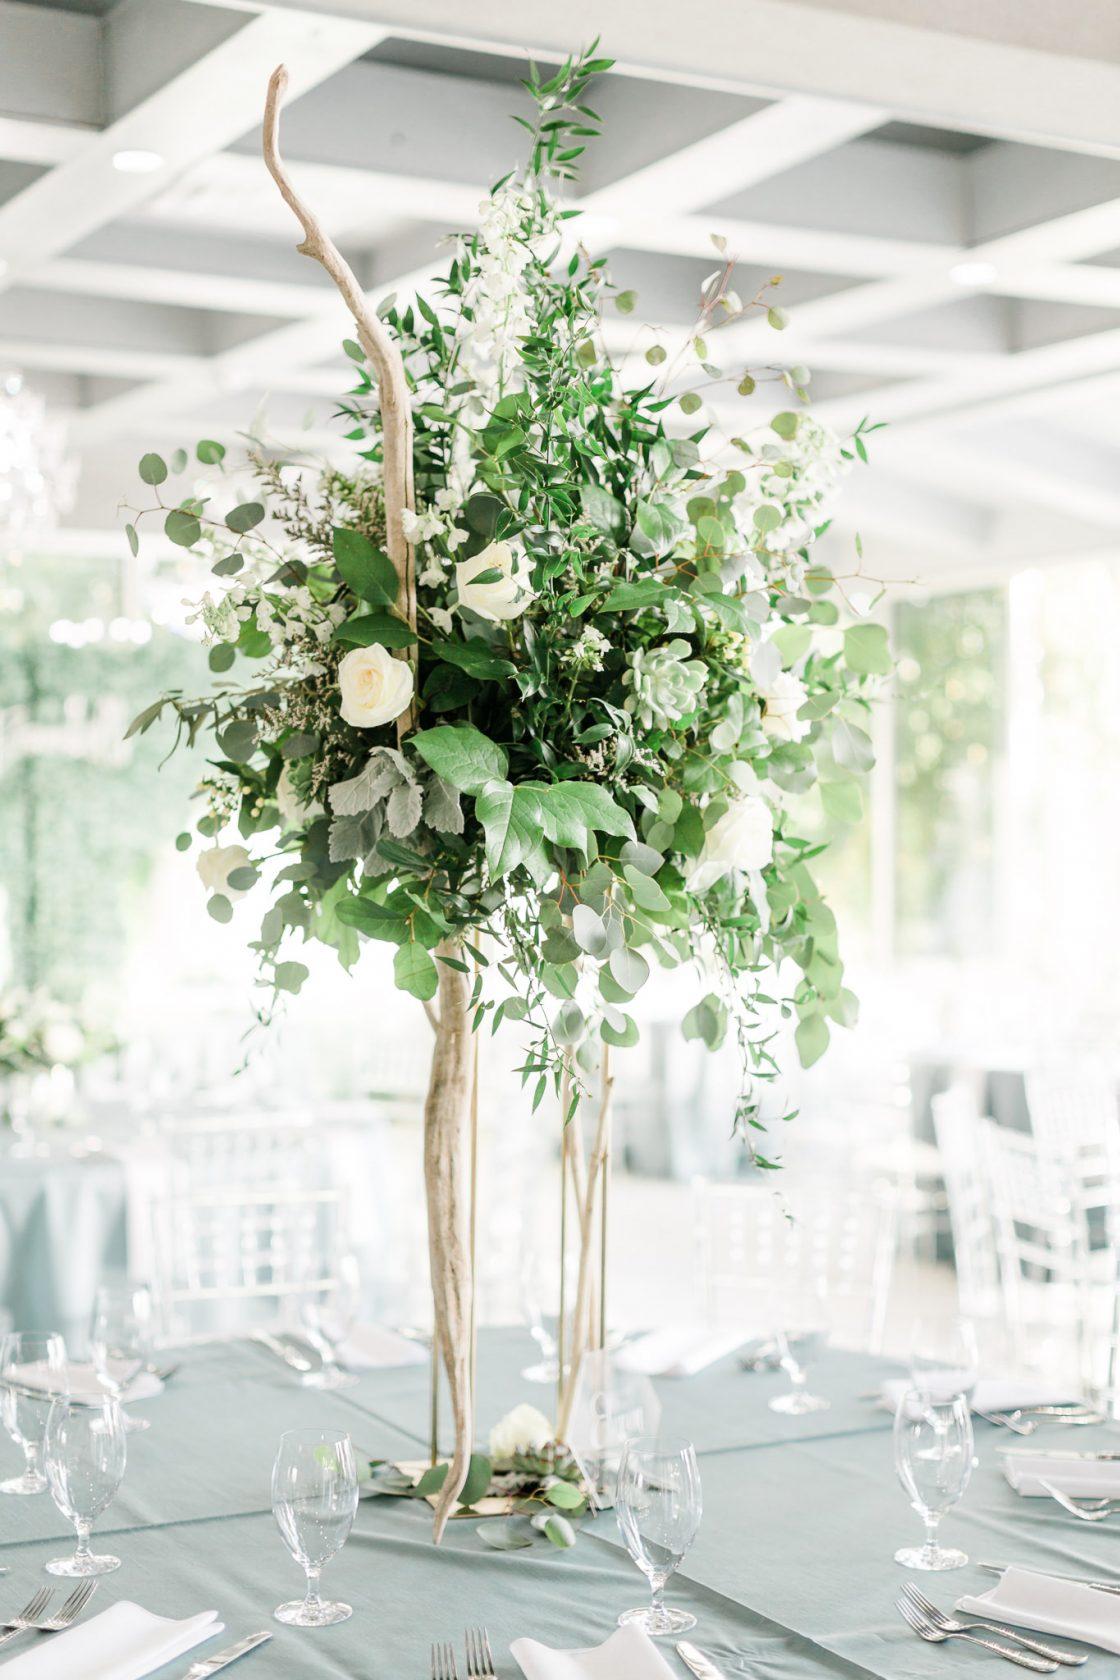 Tall White and Green Coastal Wedding Centerpieace